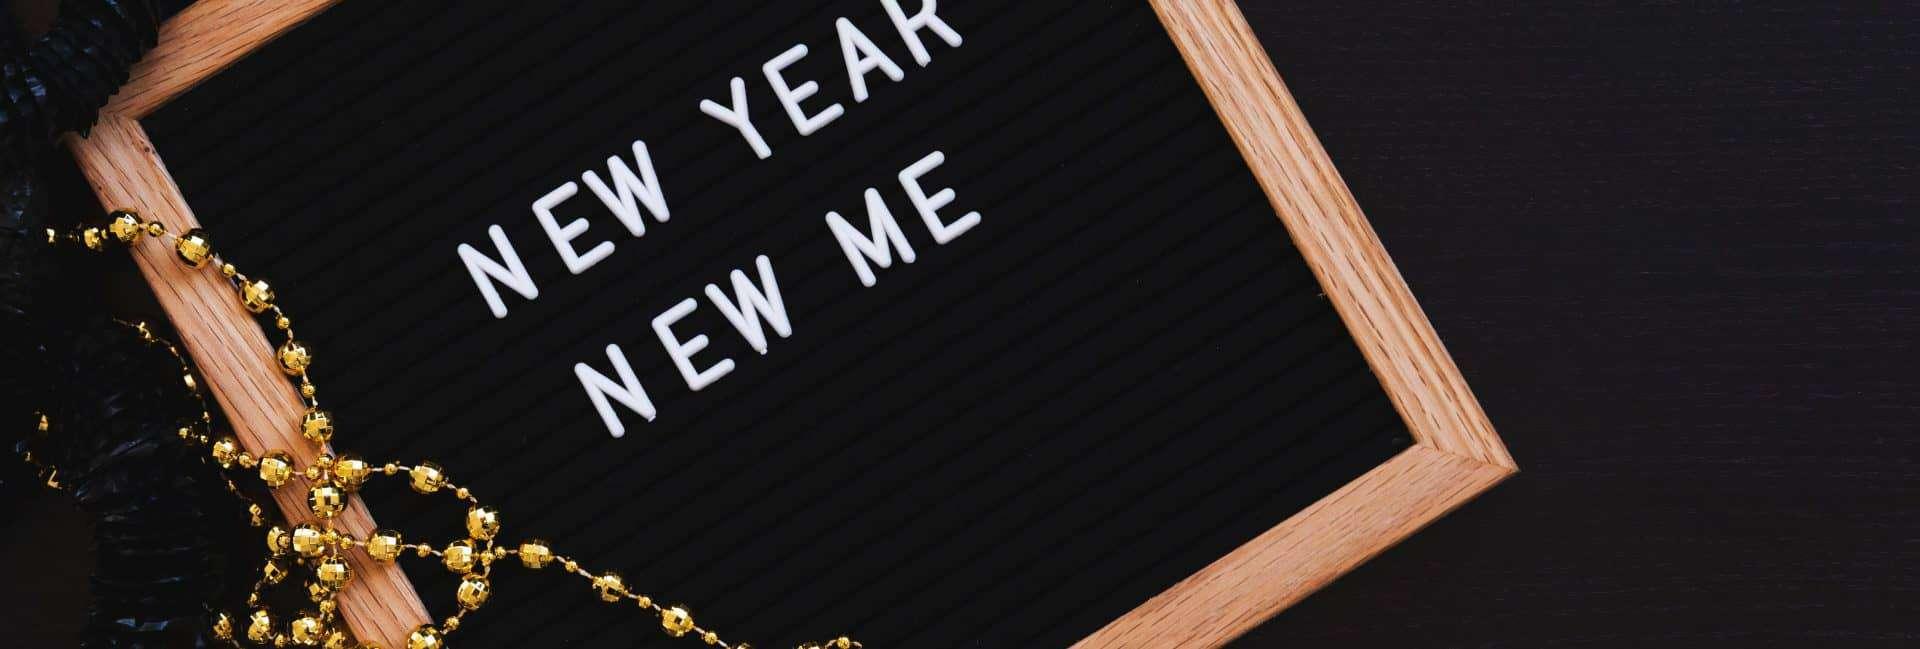 orchidfulifestyle - بداية السنة الجديدة